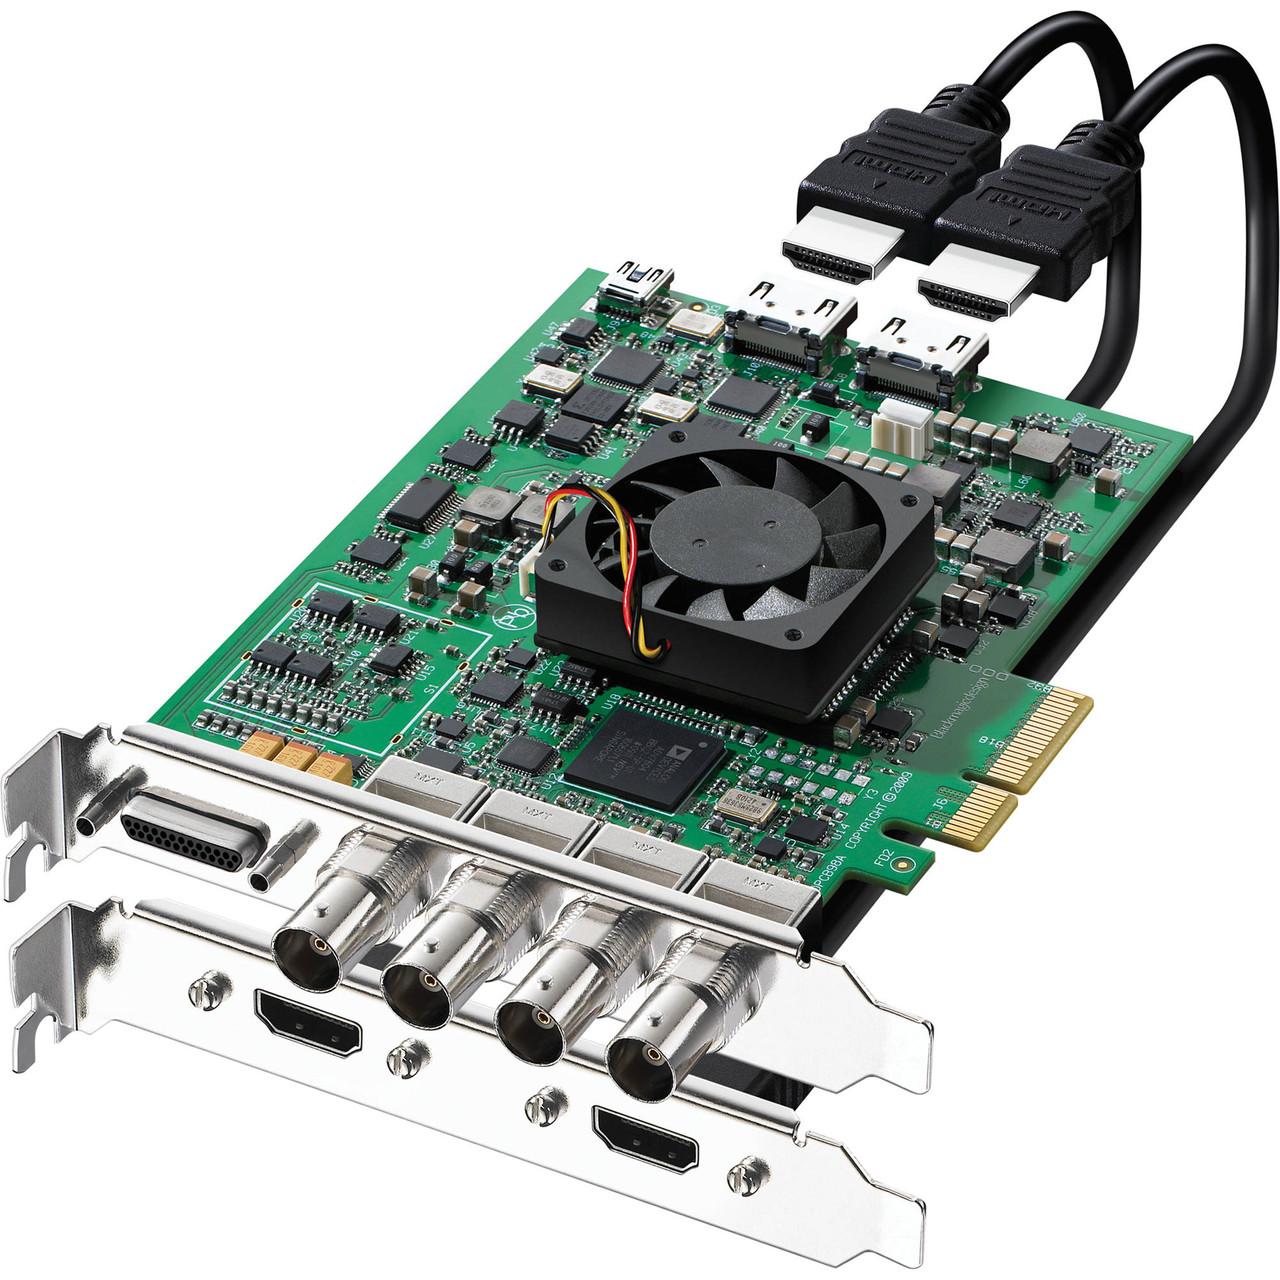 Плата захвата Blackmagic Design DeckLink 4K Extreme (BDLKHDEXTR4K)